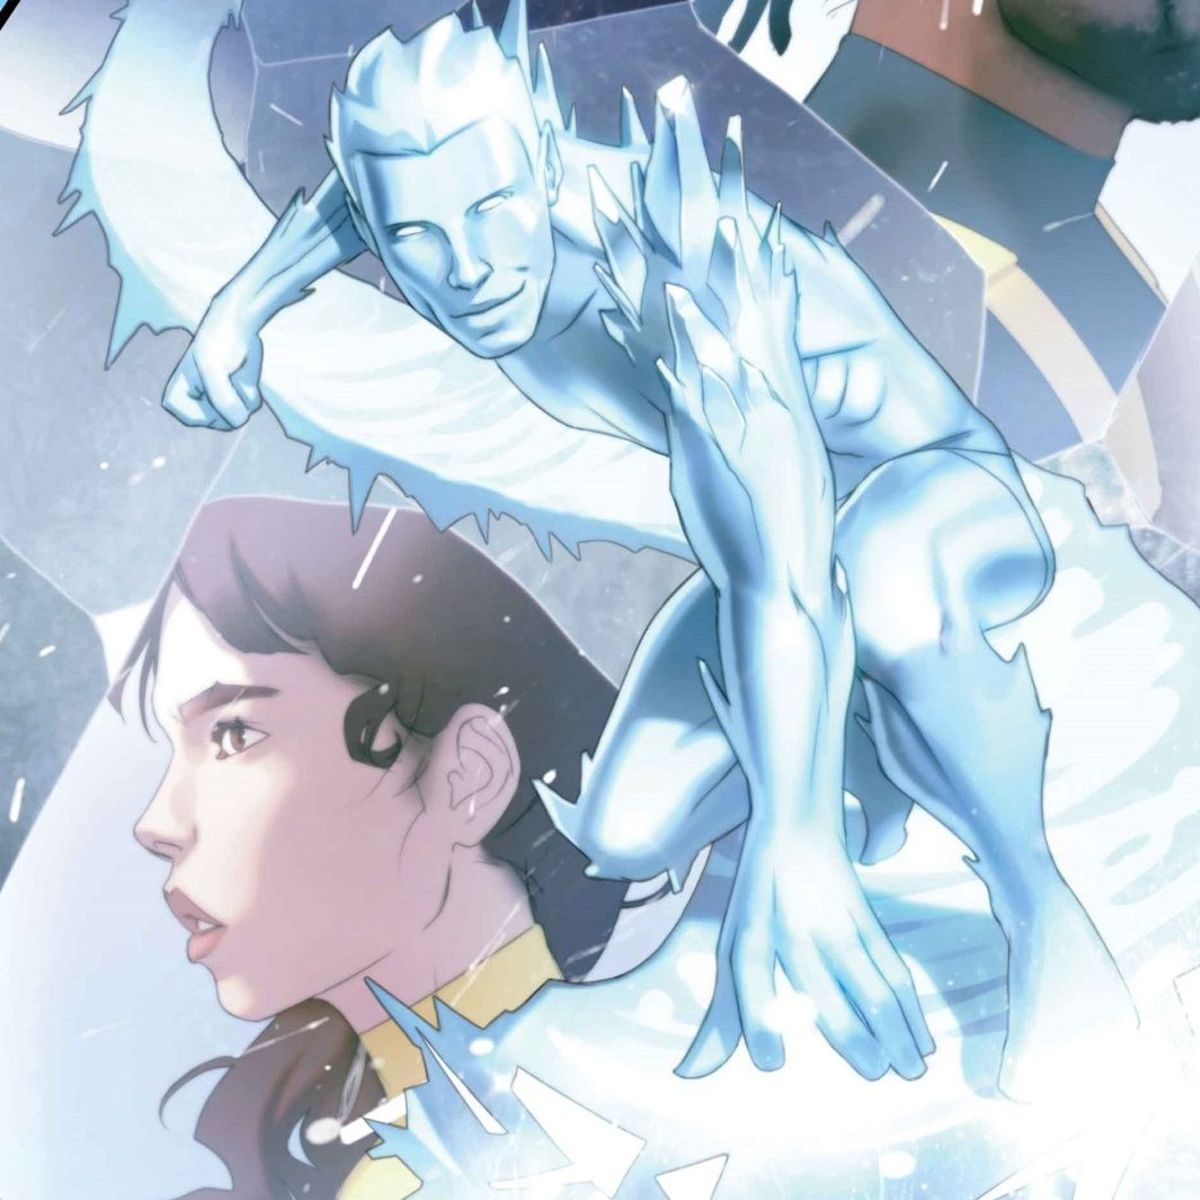 Iceman Cover - Marvel